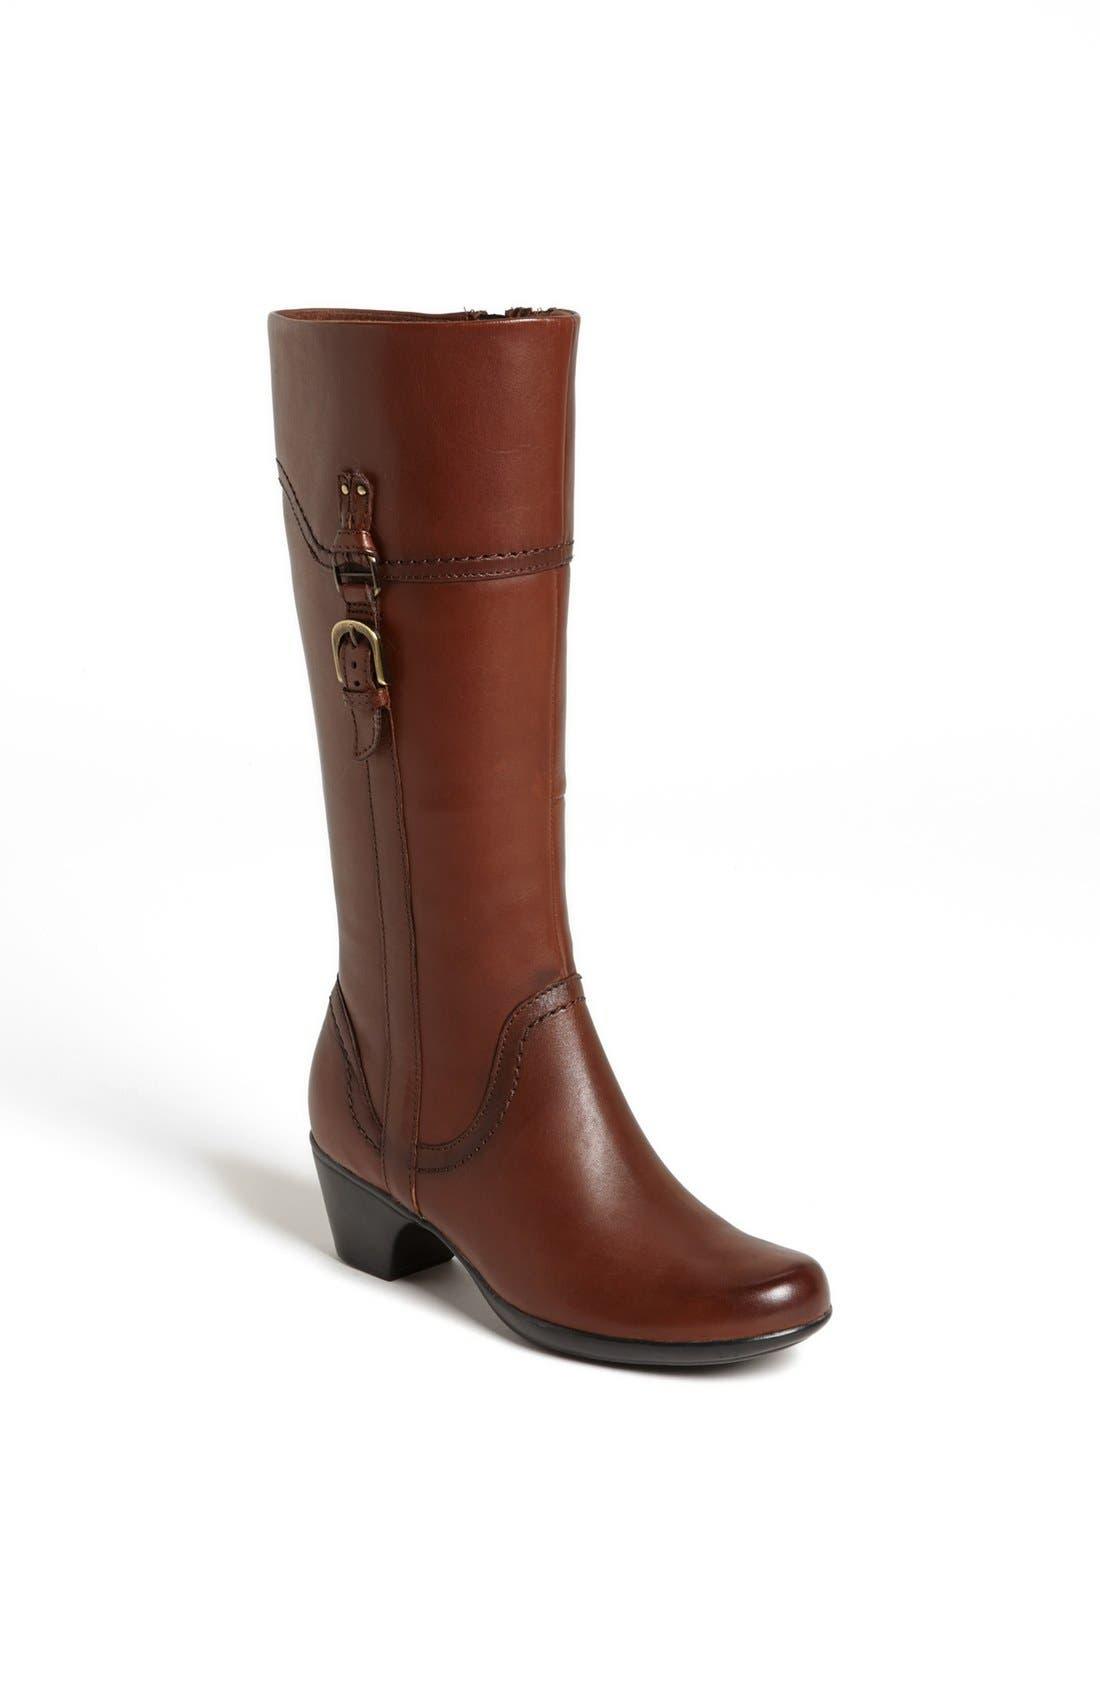 Main Image - Clarks® 'Ingalls Vicky' Boot